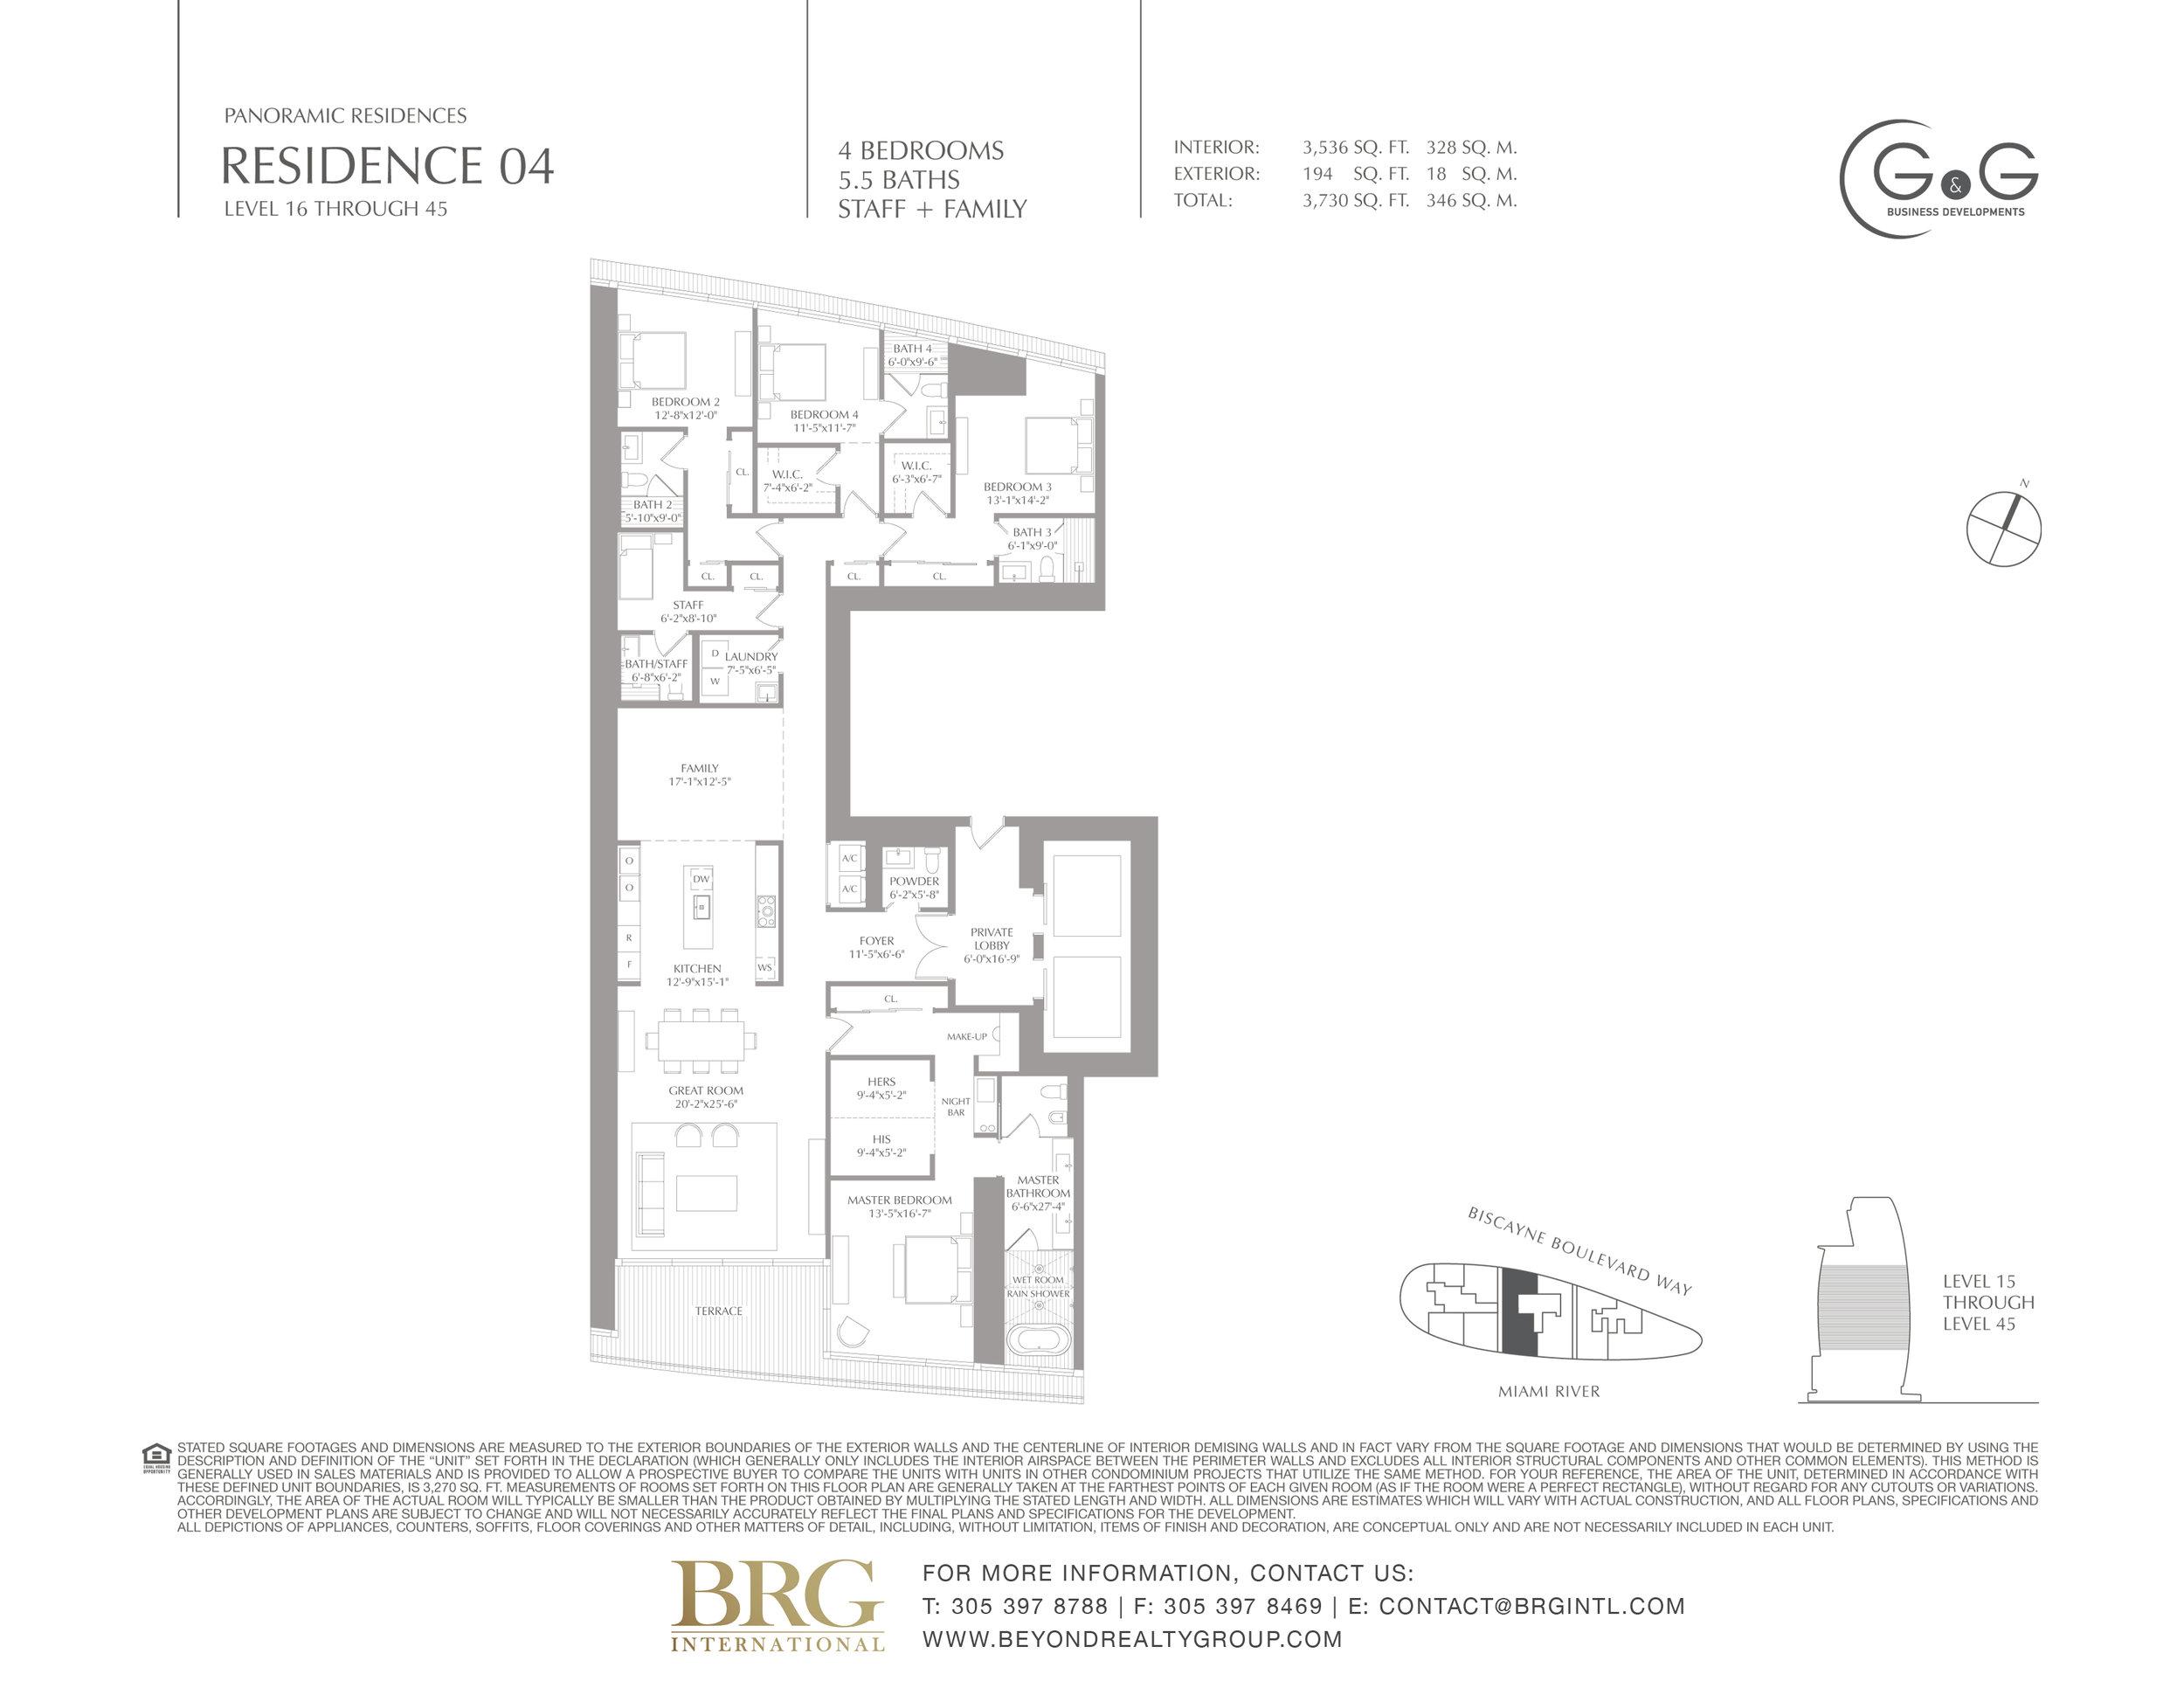 Aston-Martin-Residences-Brochure-16.jpg